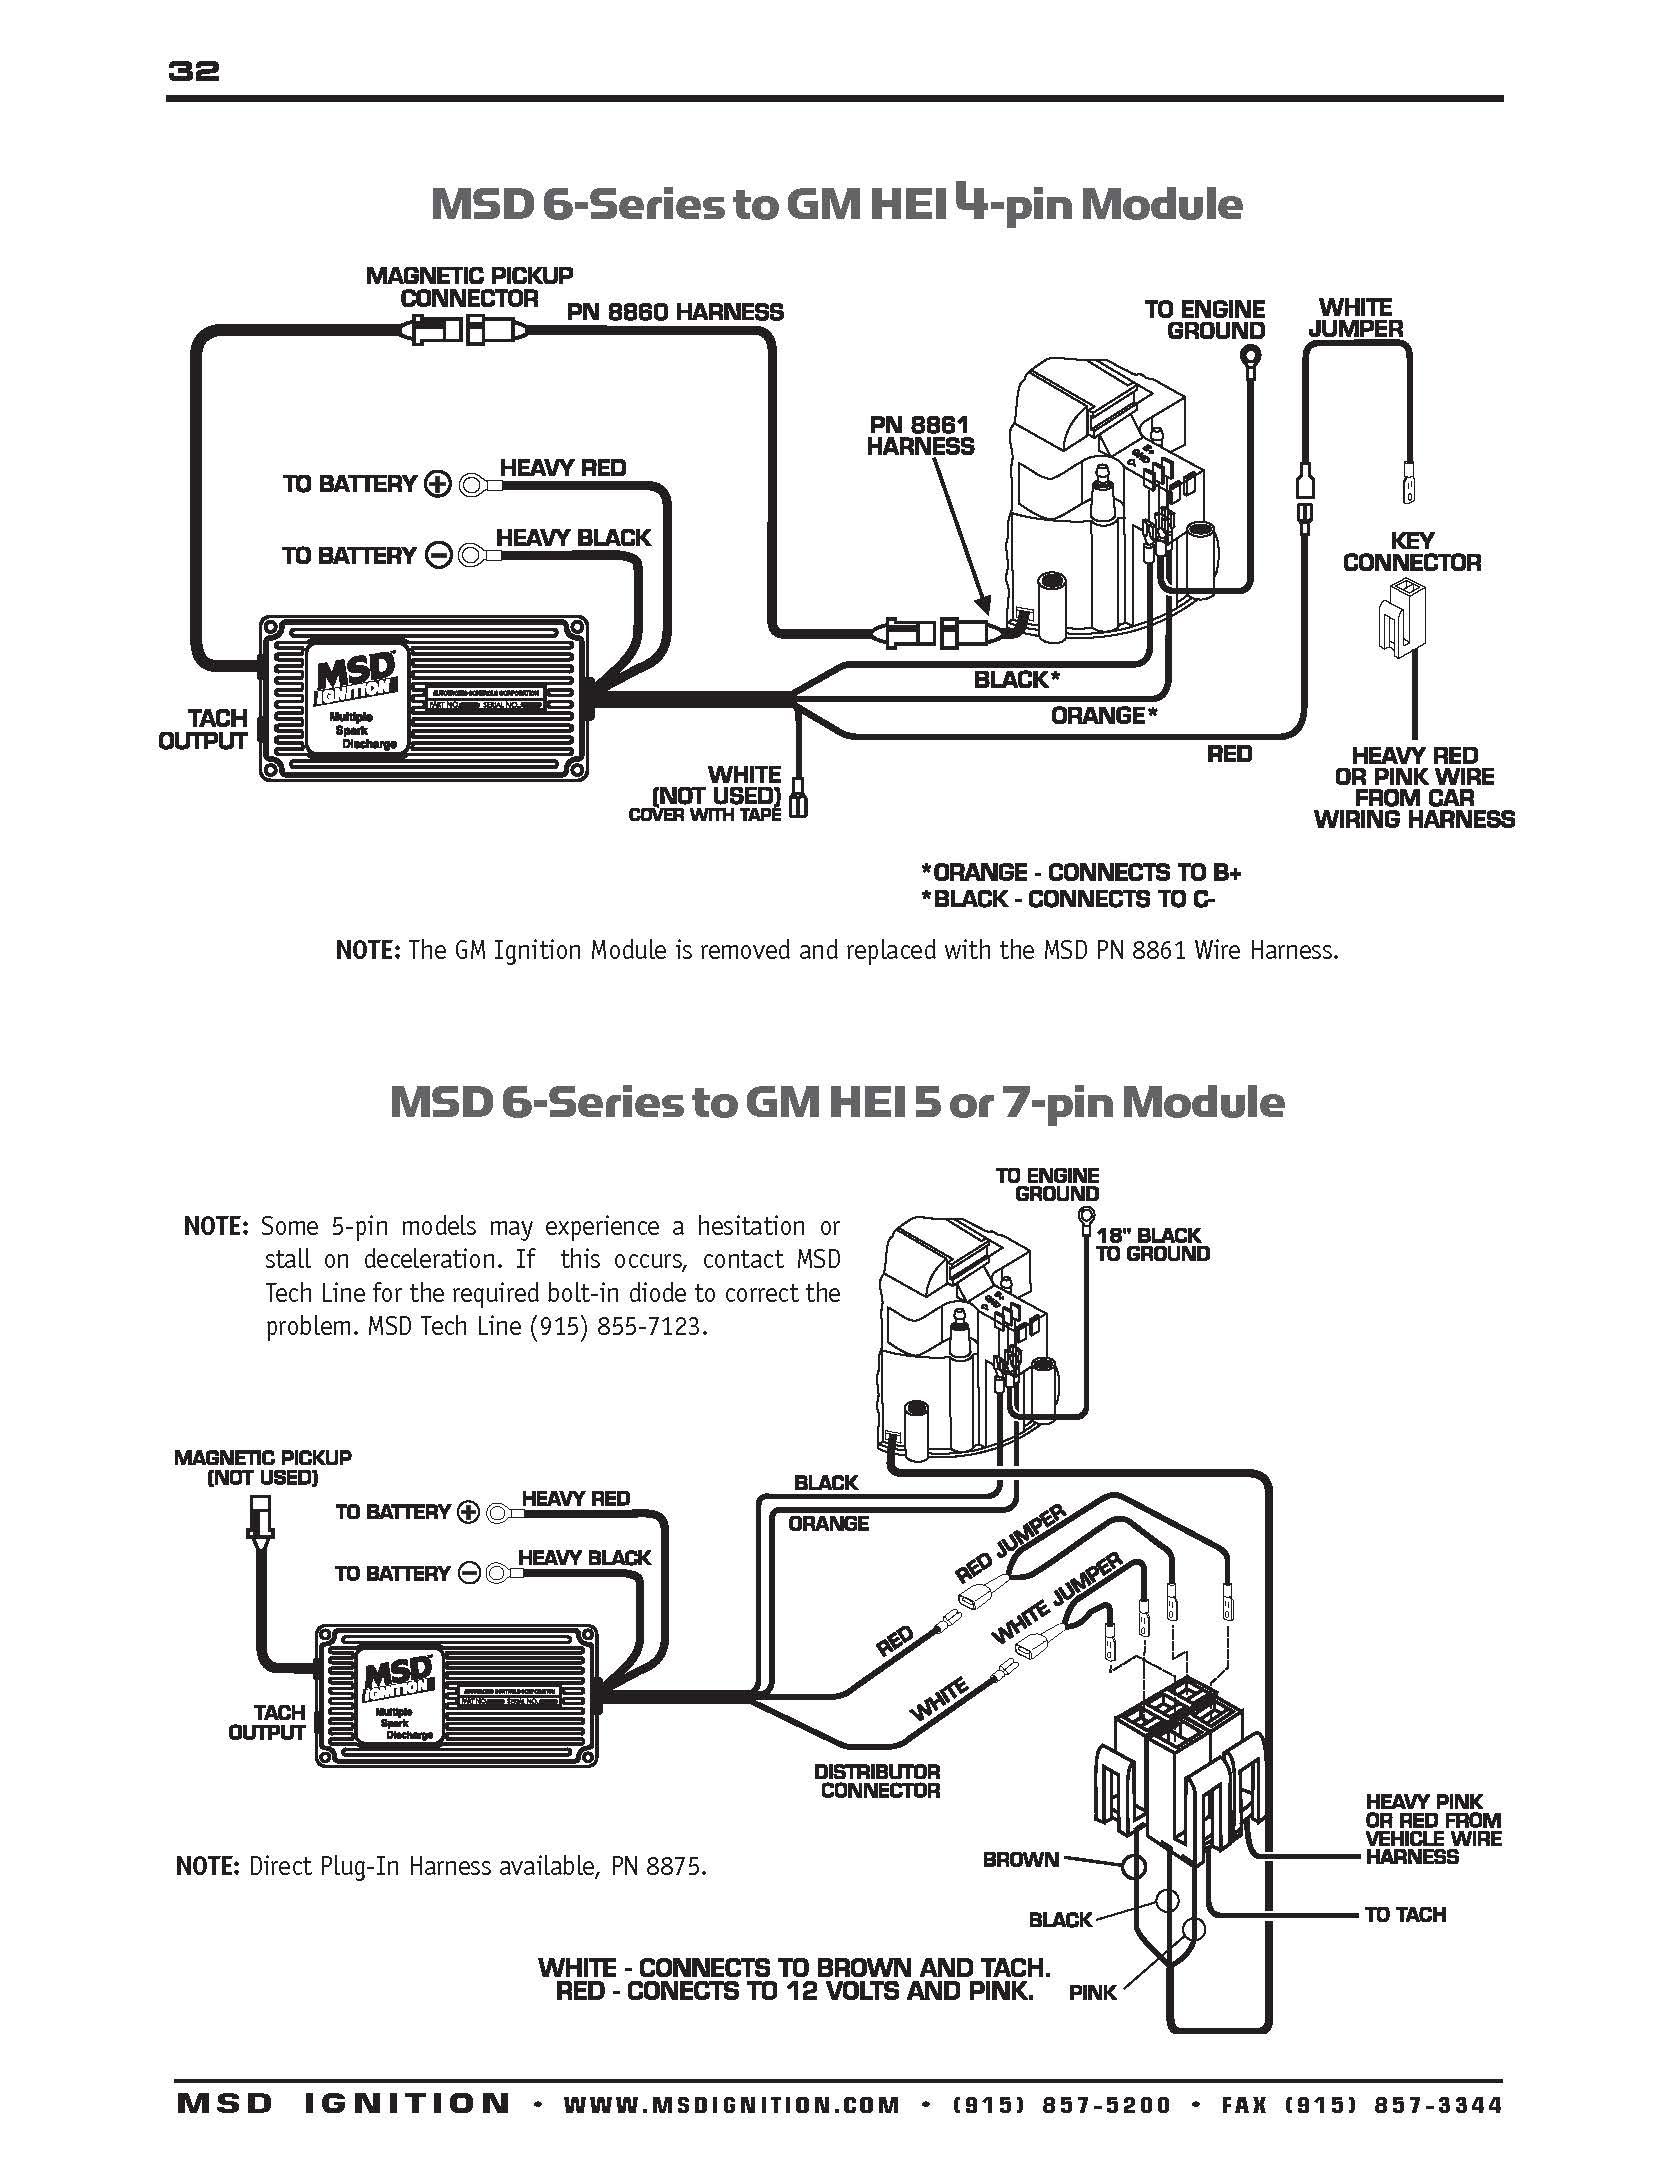 Msd Ignition 6Al Wiring Diagram | Manual E-Books - Msd Digital 6Al Wiring Diagram